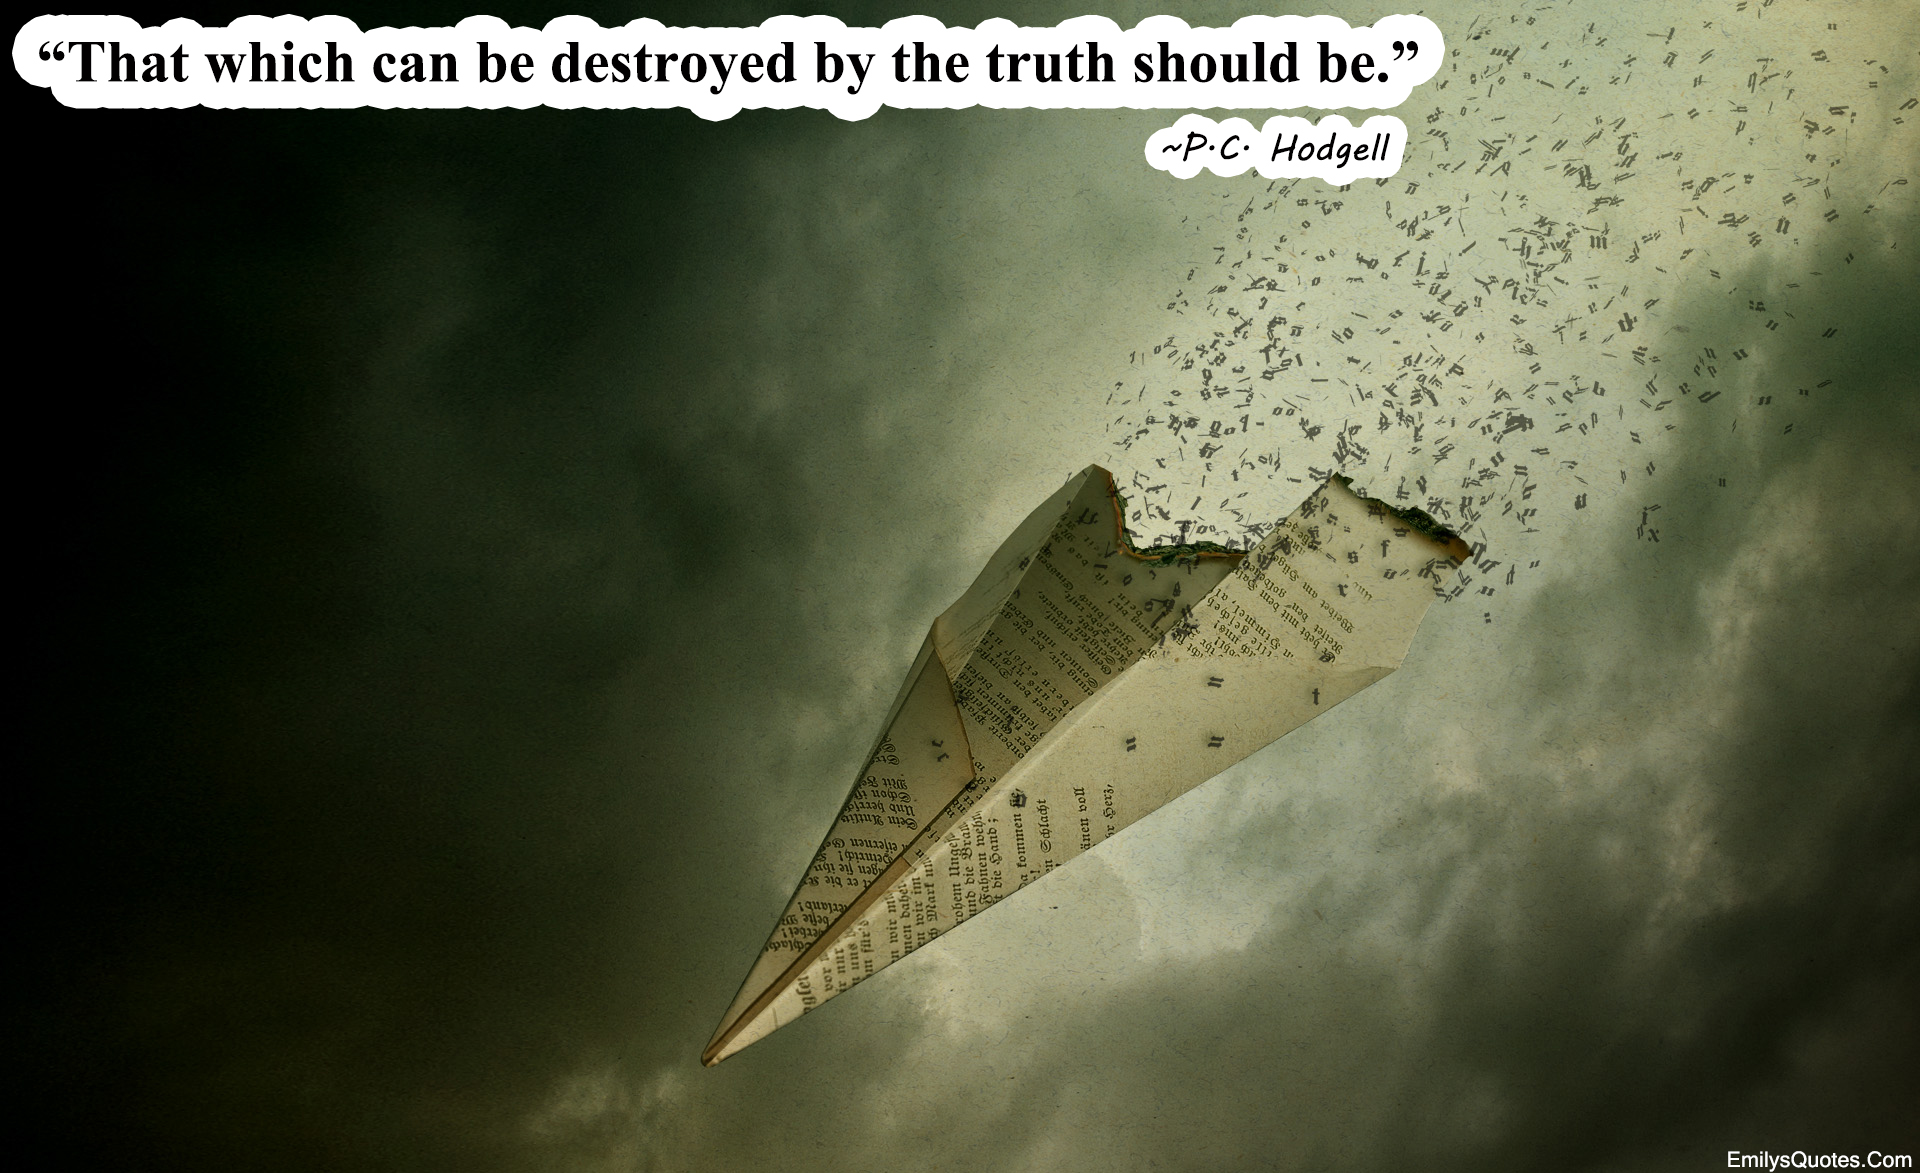 EmilysQuotes.Com - truth, destroy, P.C. Hodgell